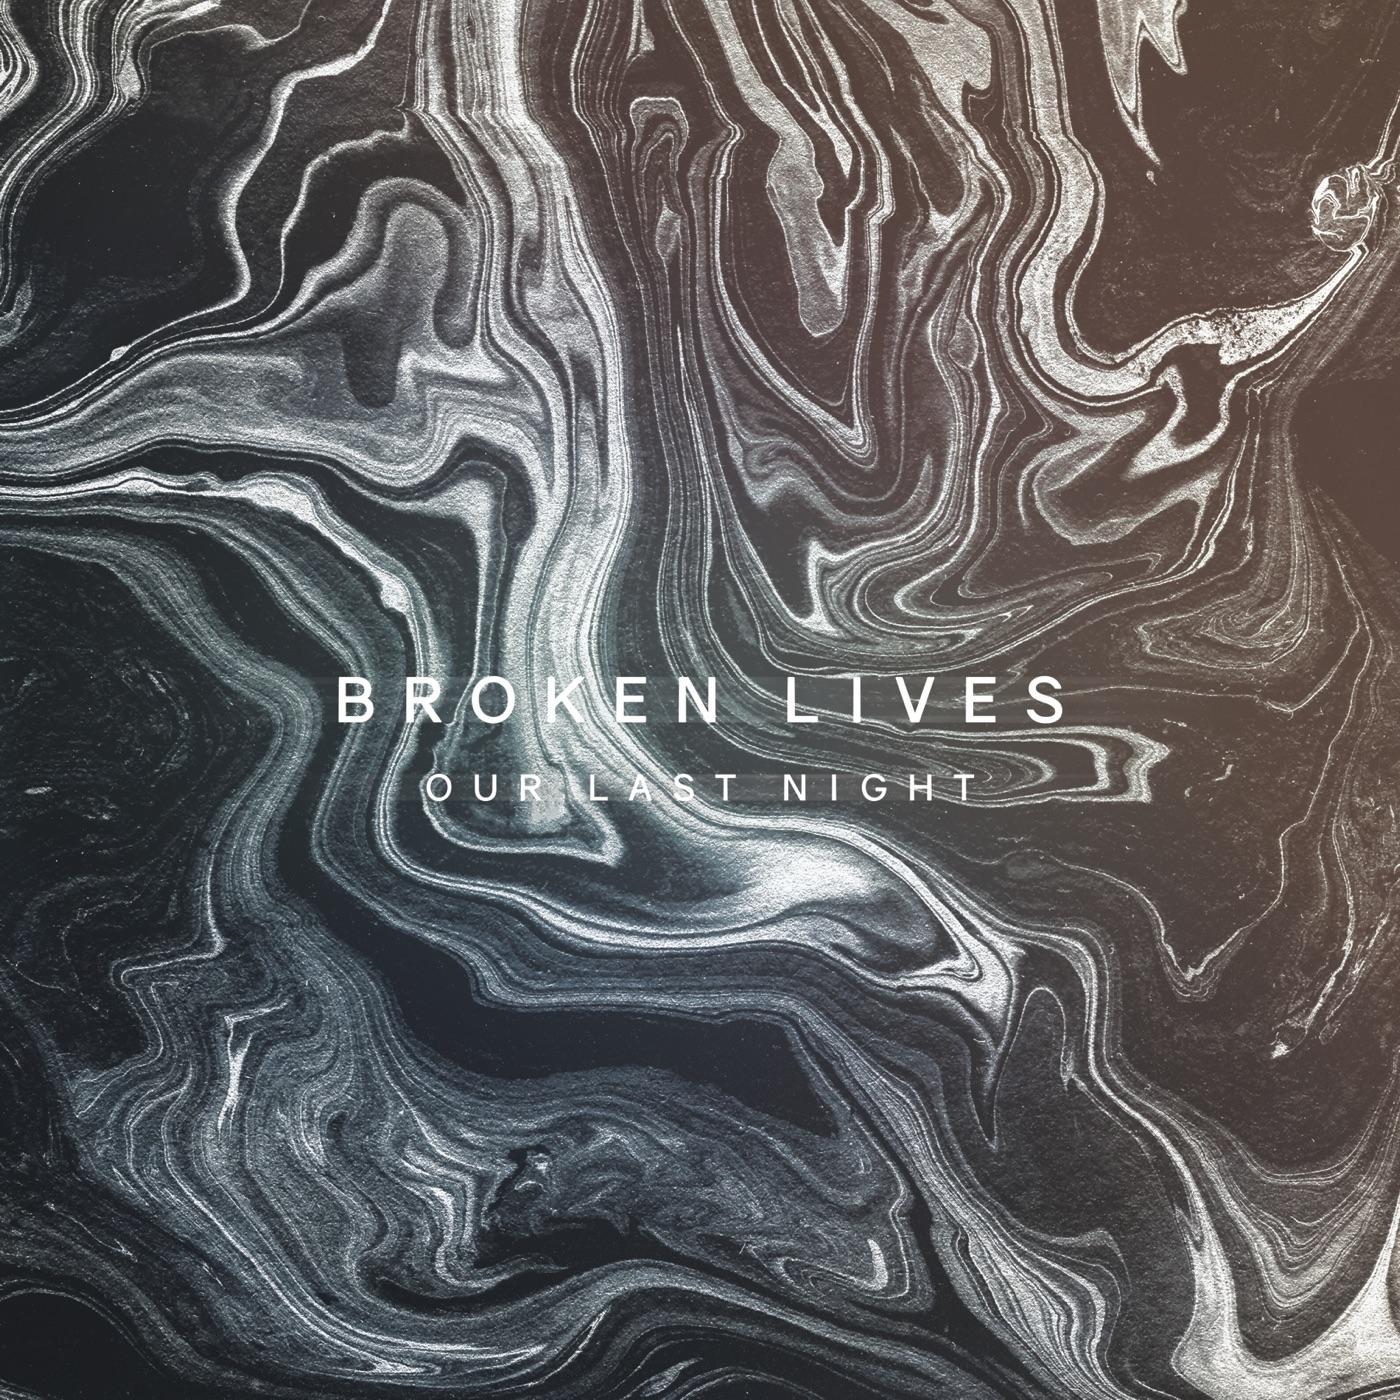 Our Last Night - Broken Lives [single] (2017)